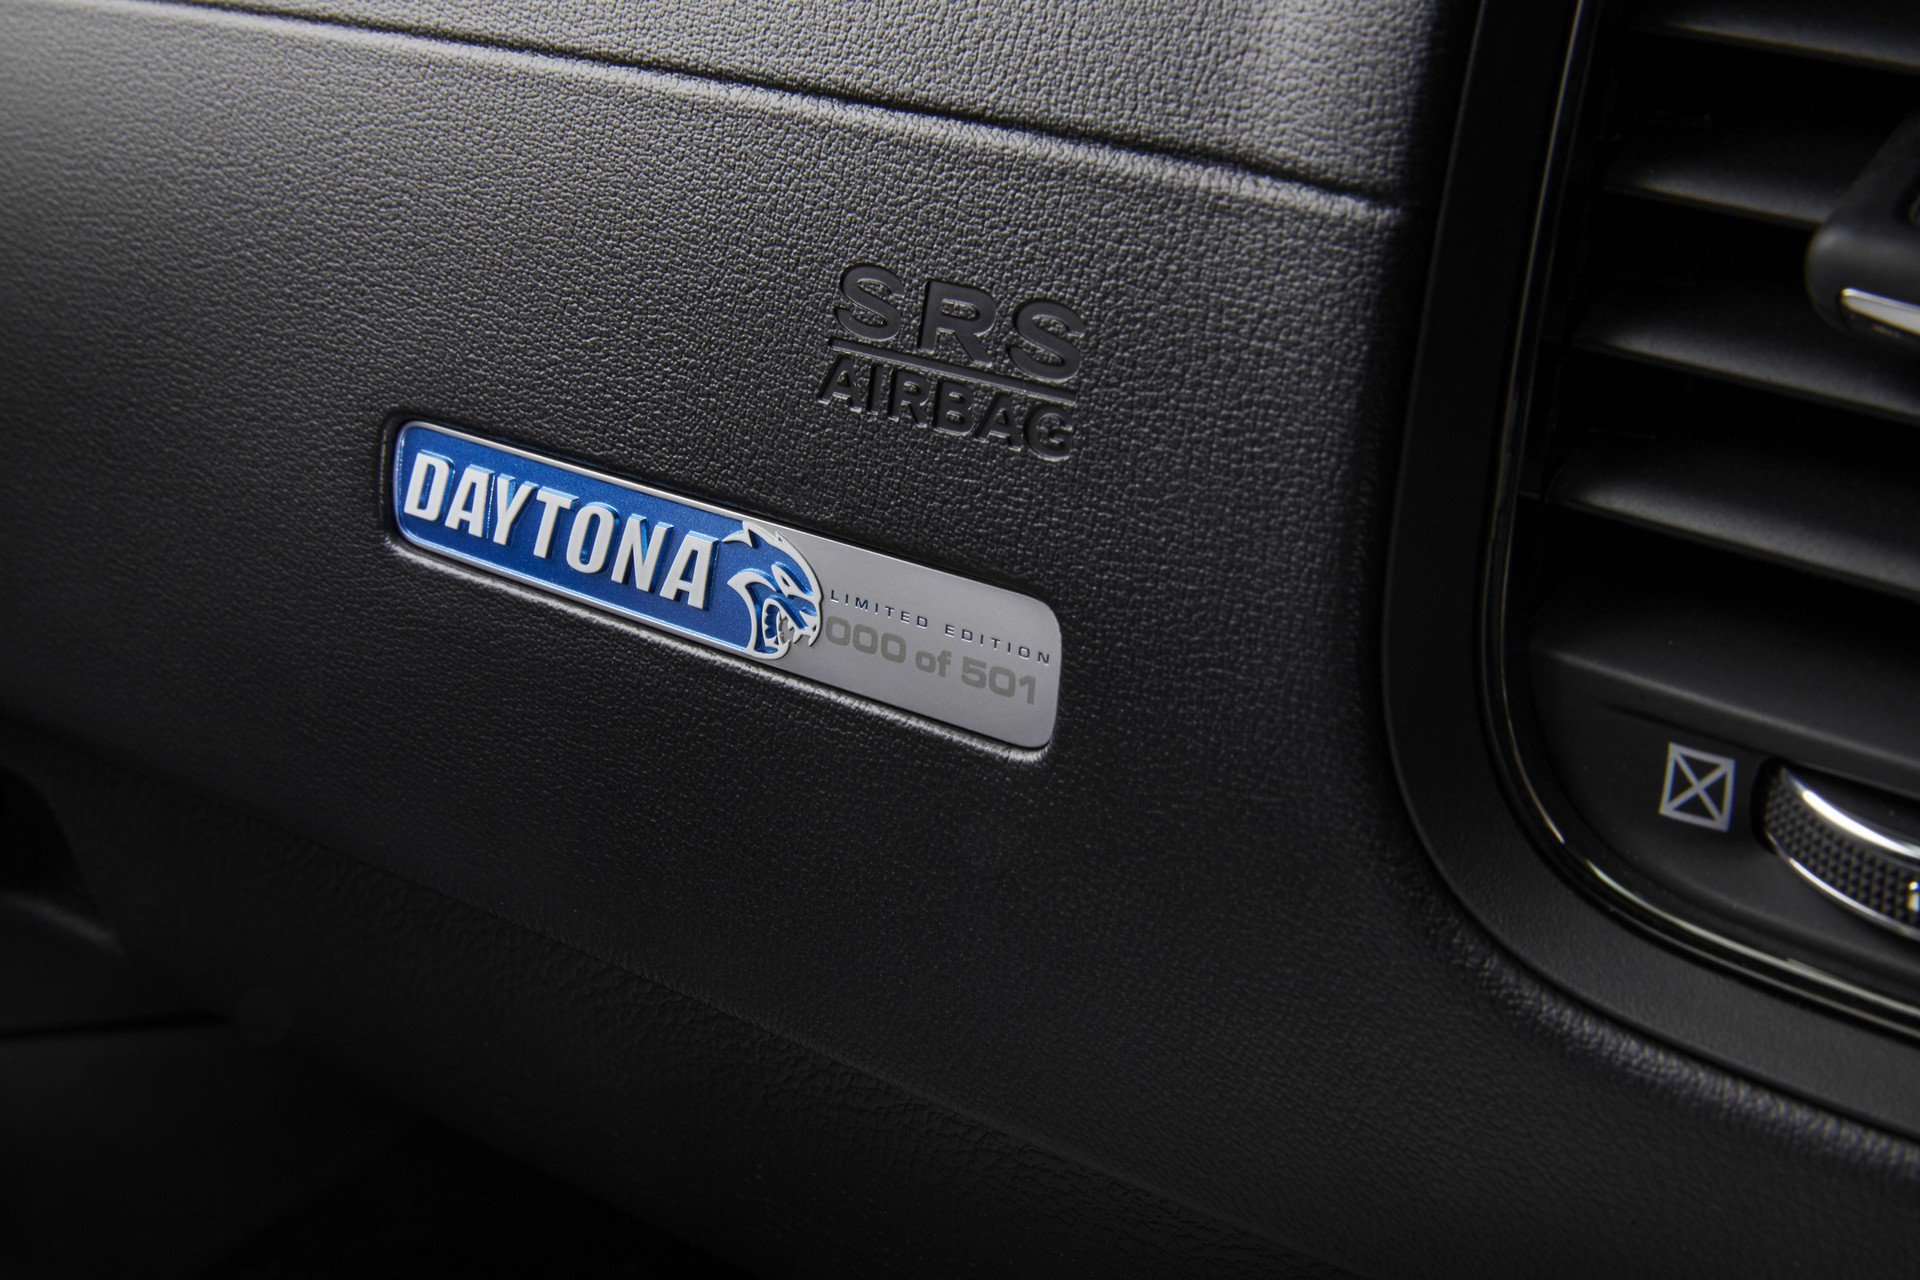 Dodge-Charger-SRT-Hellcat-Widebody-Daytona-50th-Anniversary-Edition-8